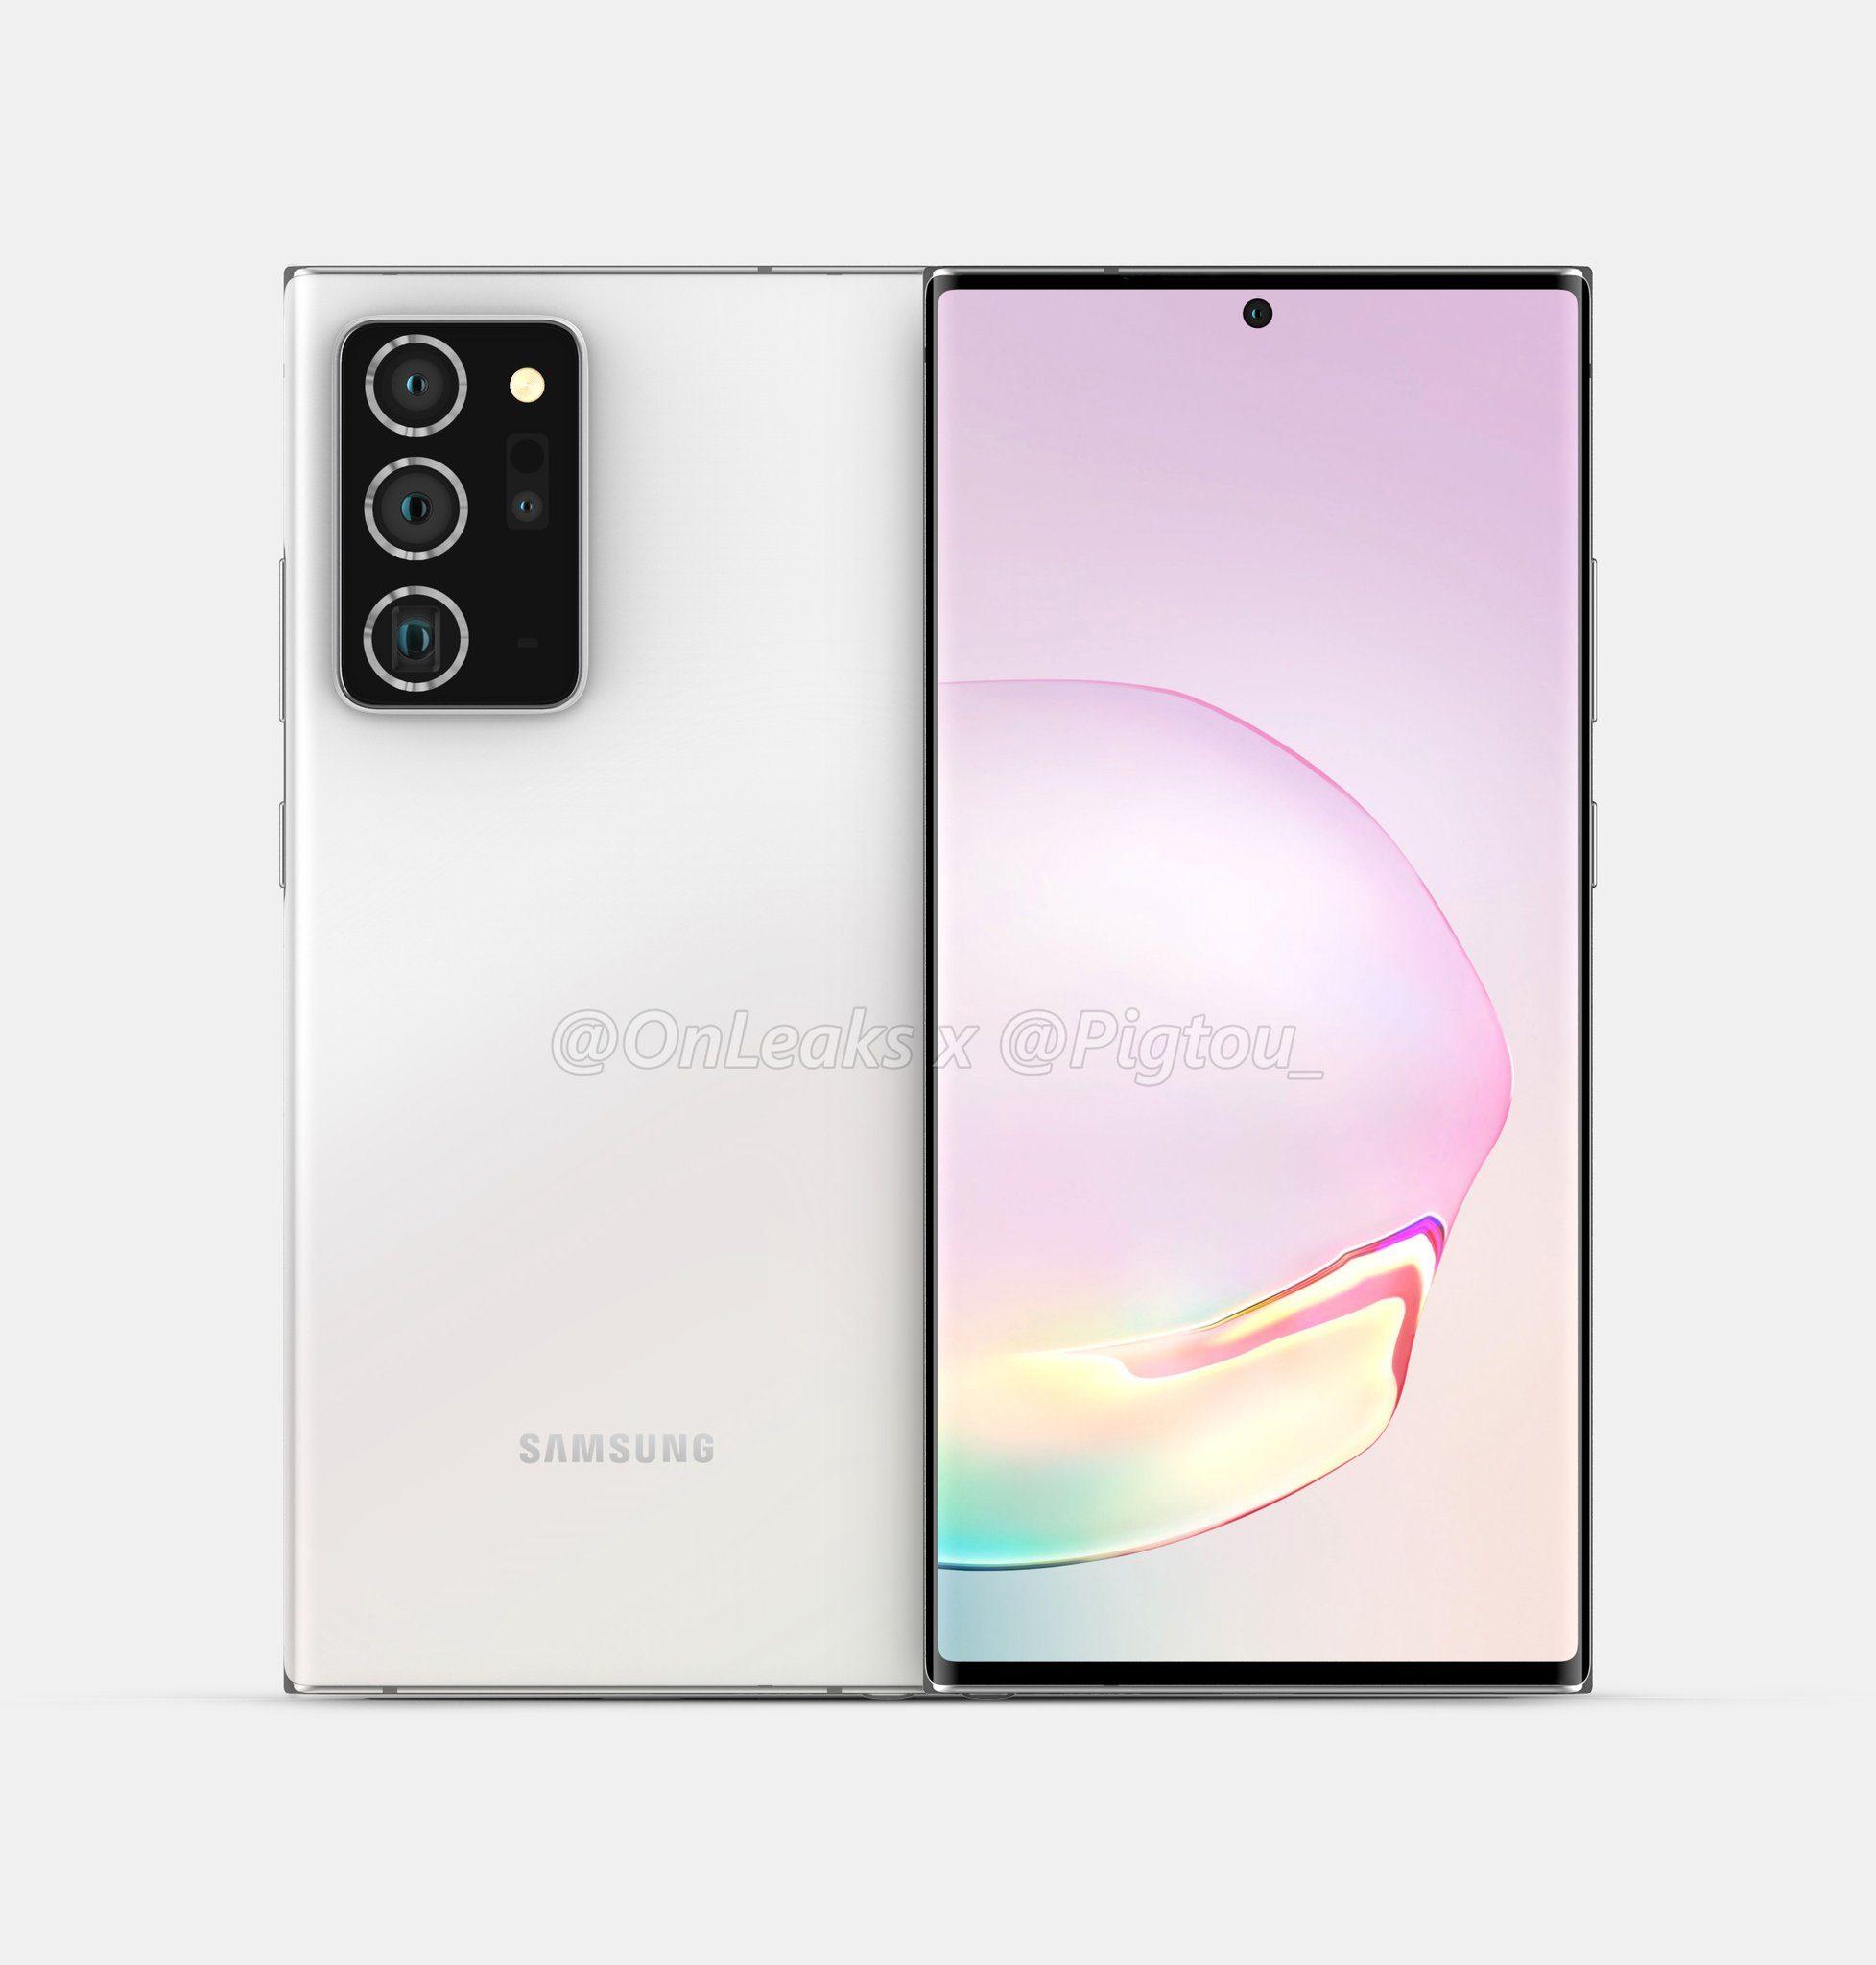 Samsung Note 20 Plus camera